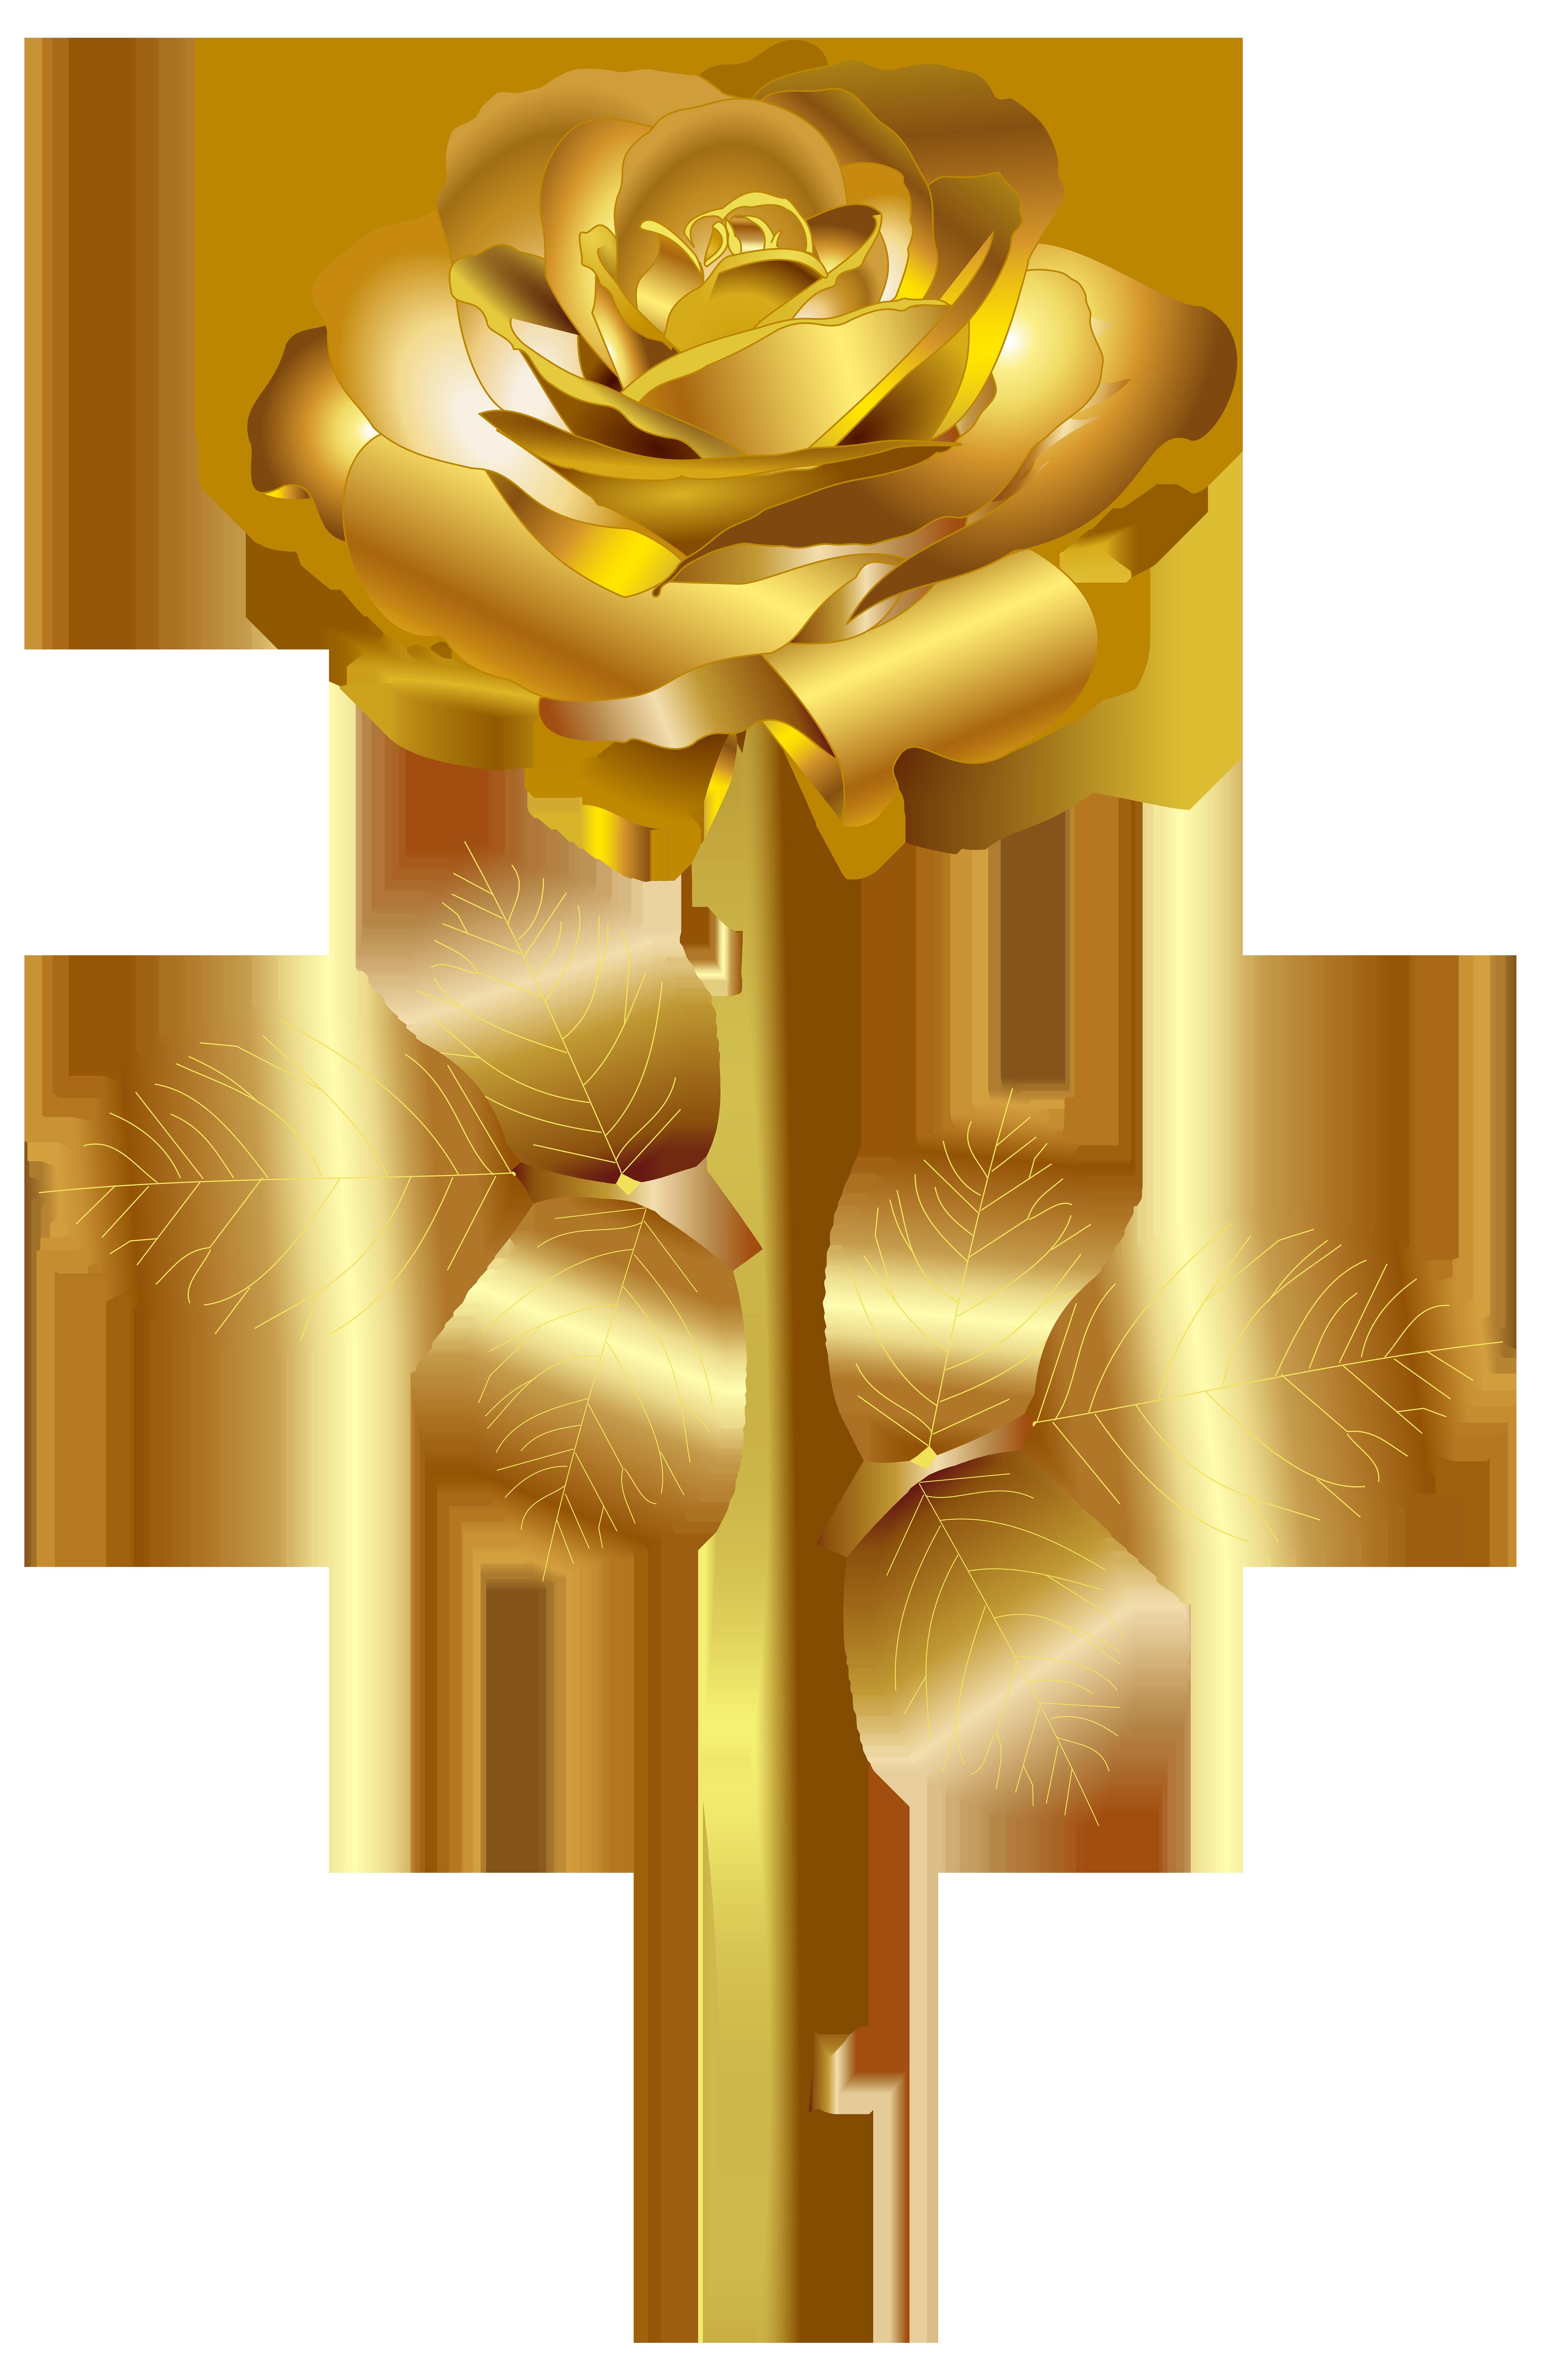 Rose clipart rose gold. Png clip art image